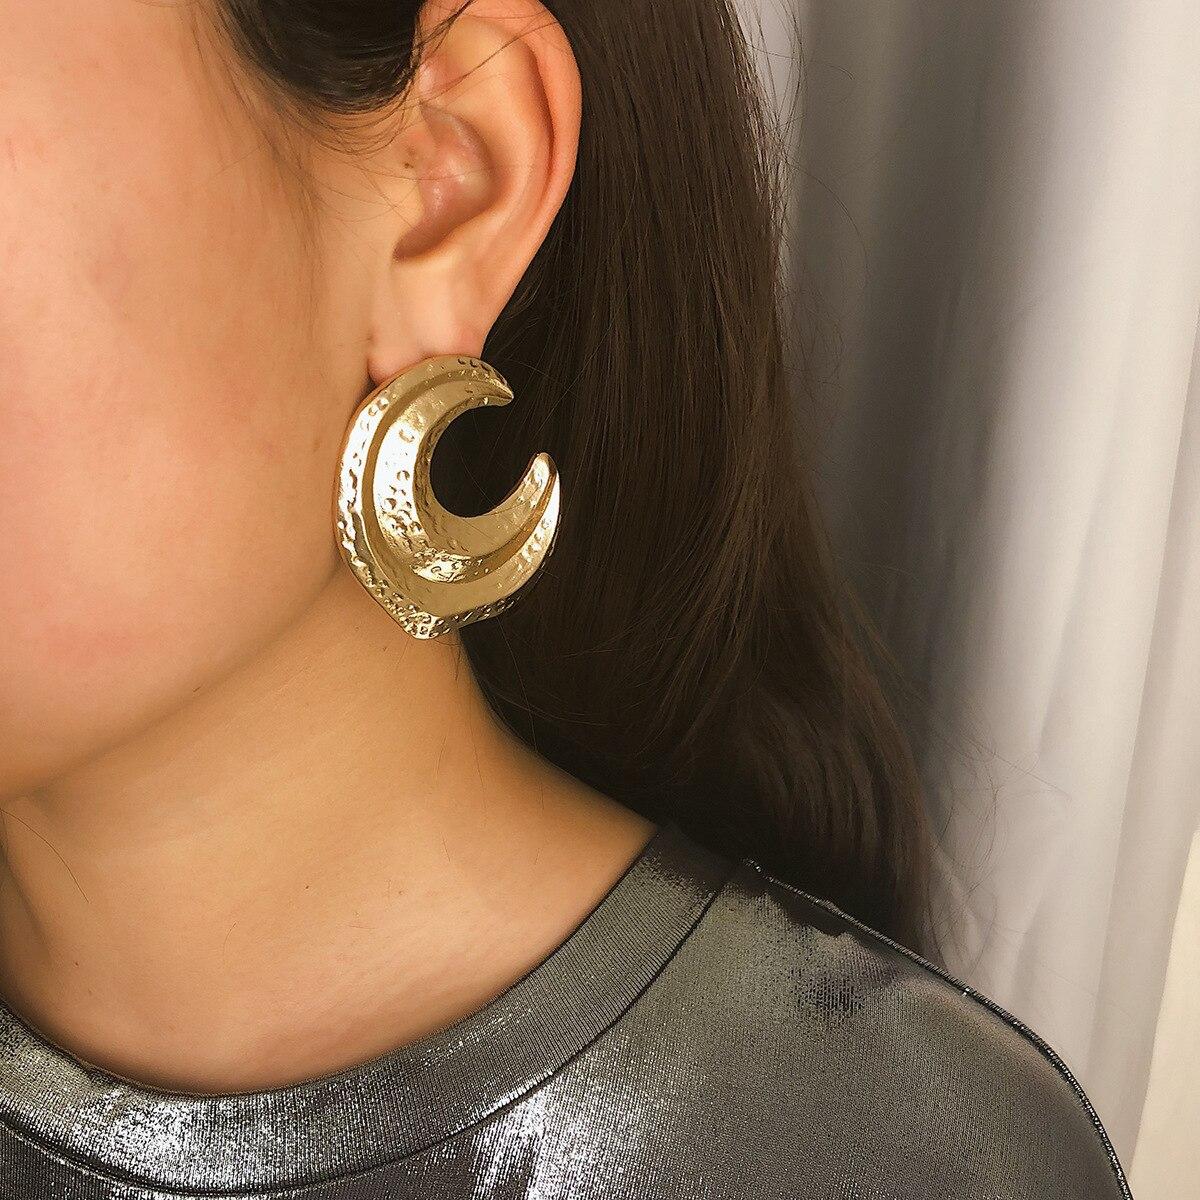 Exagerada Big Crescent Moon Brincos Do Parafuso Prisioneiro Do Vintage para Mulheres Moda Moderna Gótico Jóias Acessórios Femininos Oorbellen